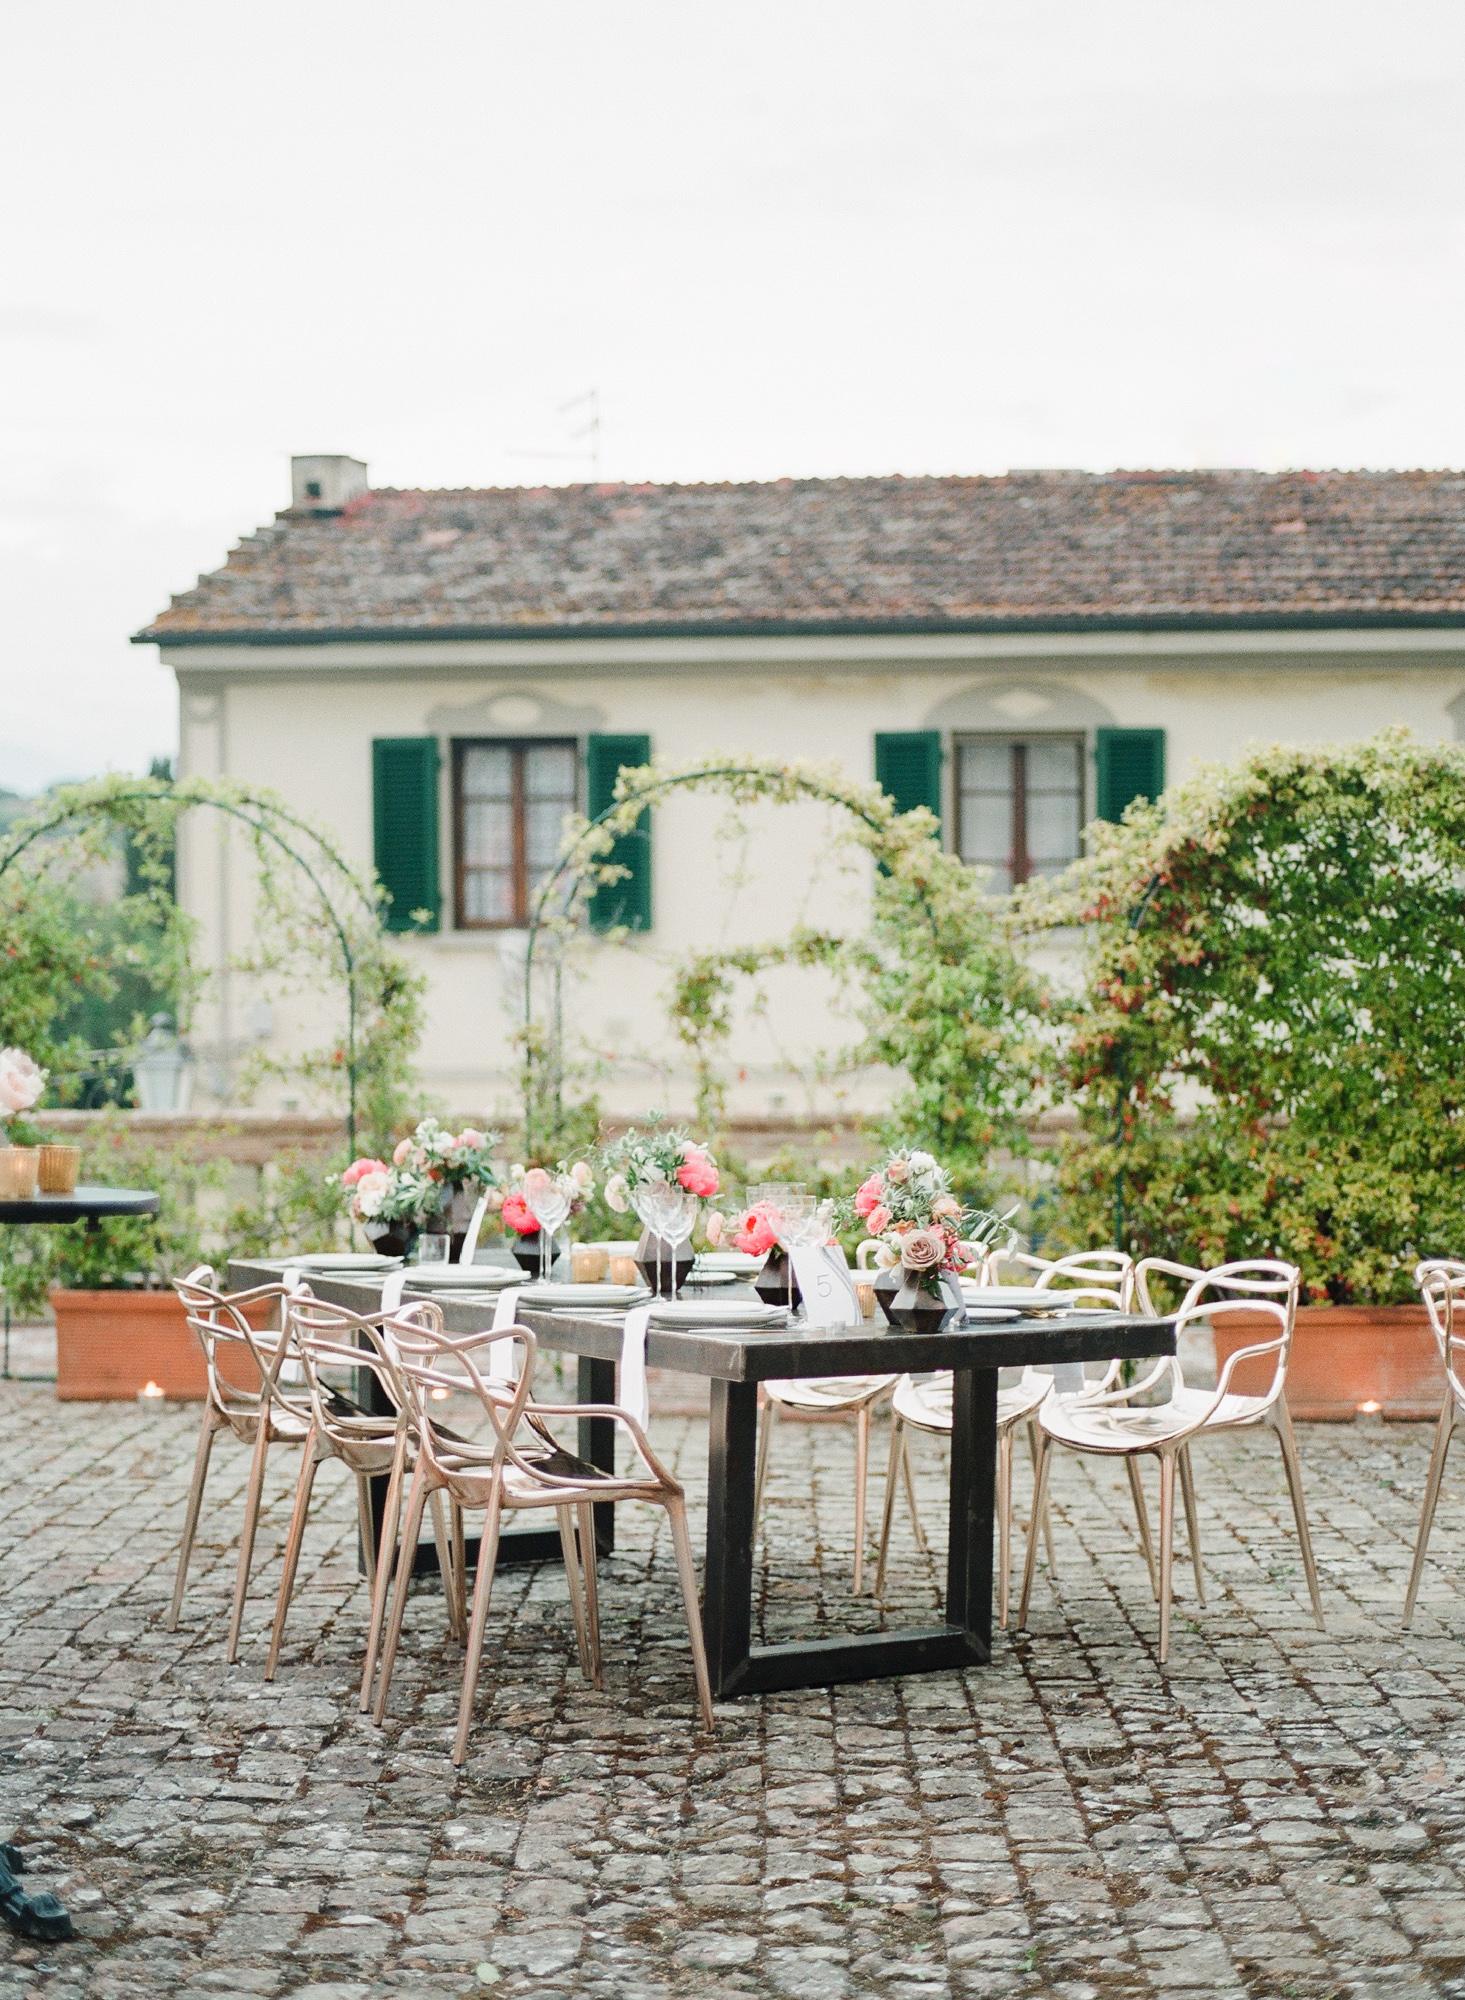 Tuscany-Wedding-Venues-27.jpg